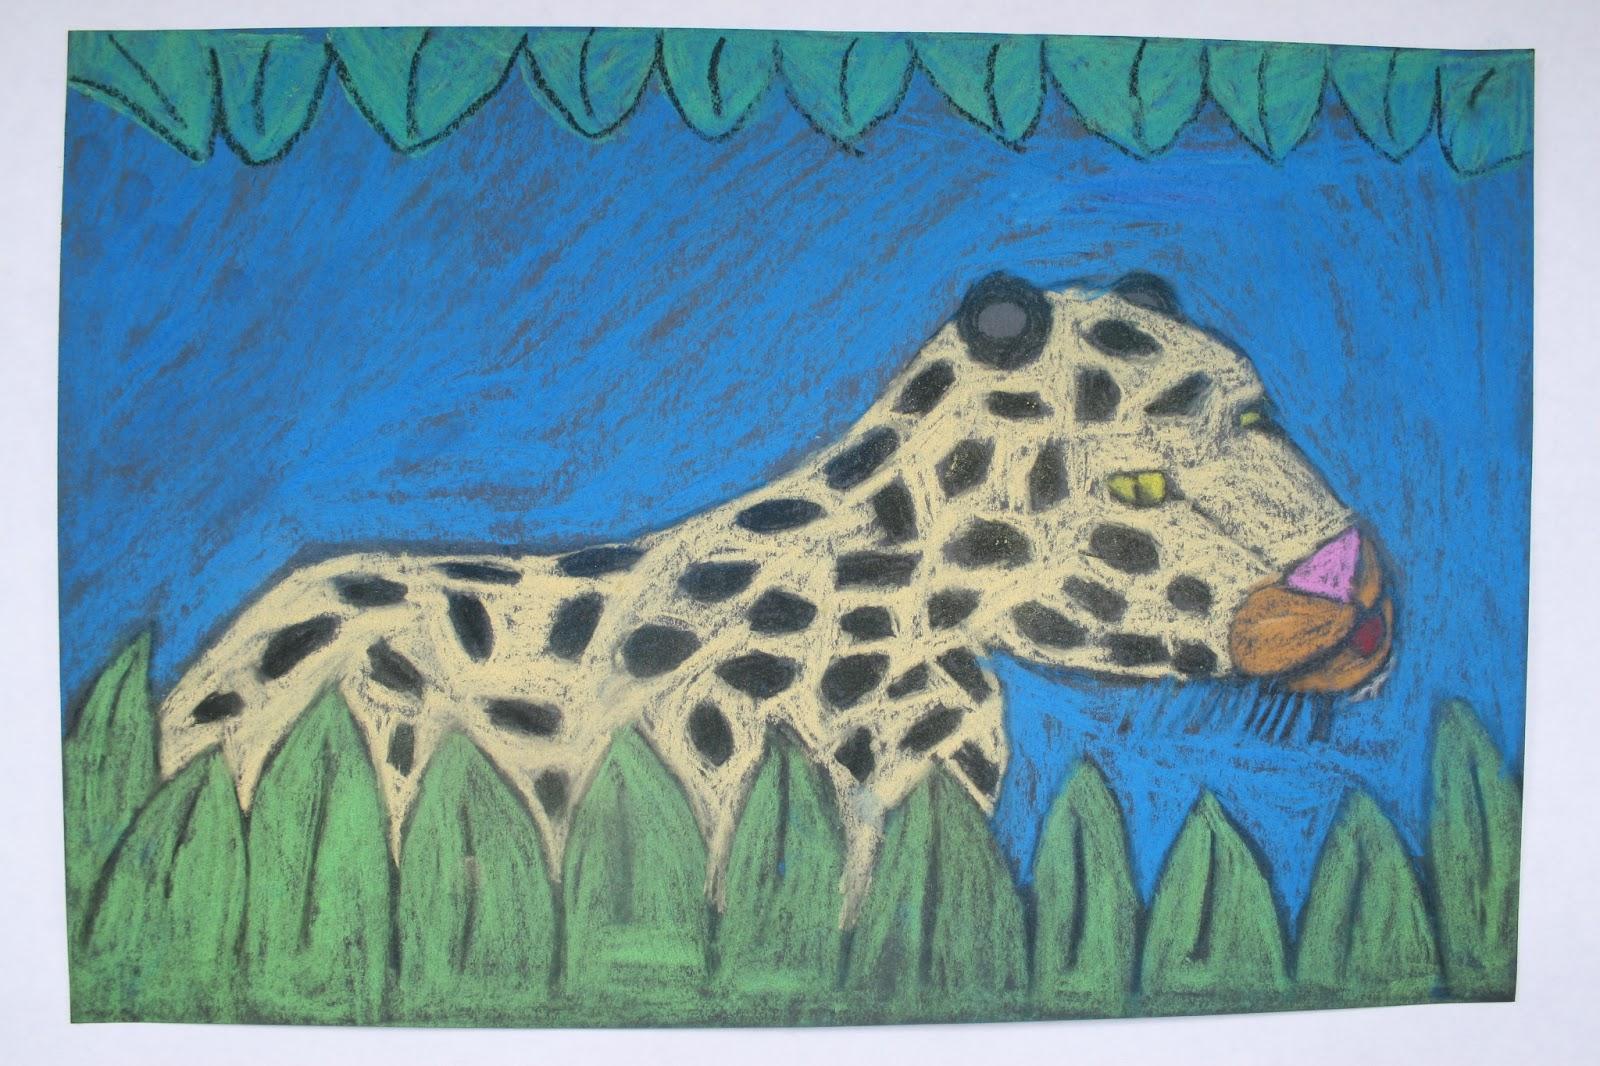 Drawn rainforest tropical rainforest biome Create animal Hyde Artroom of